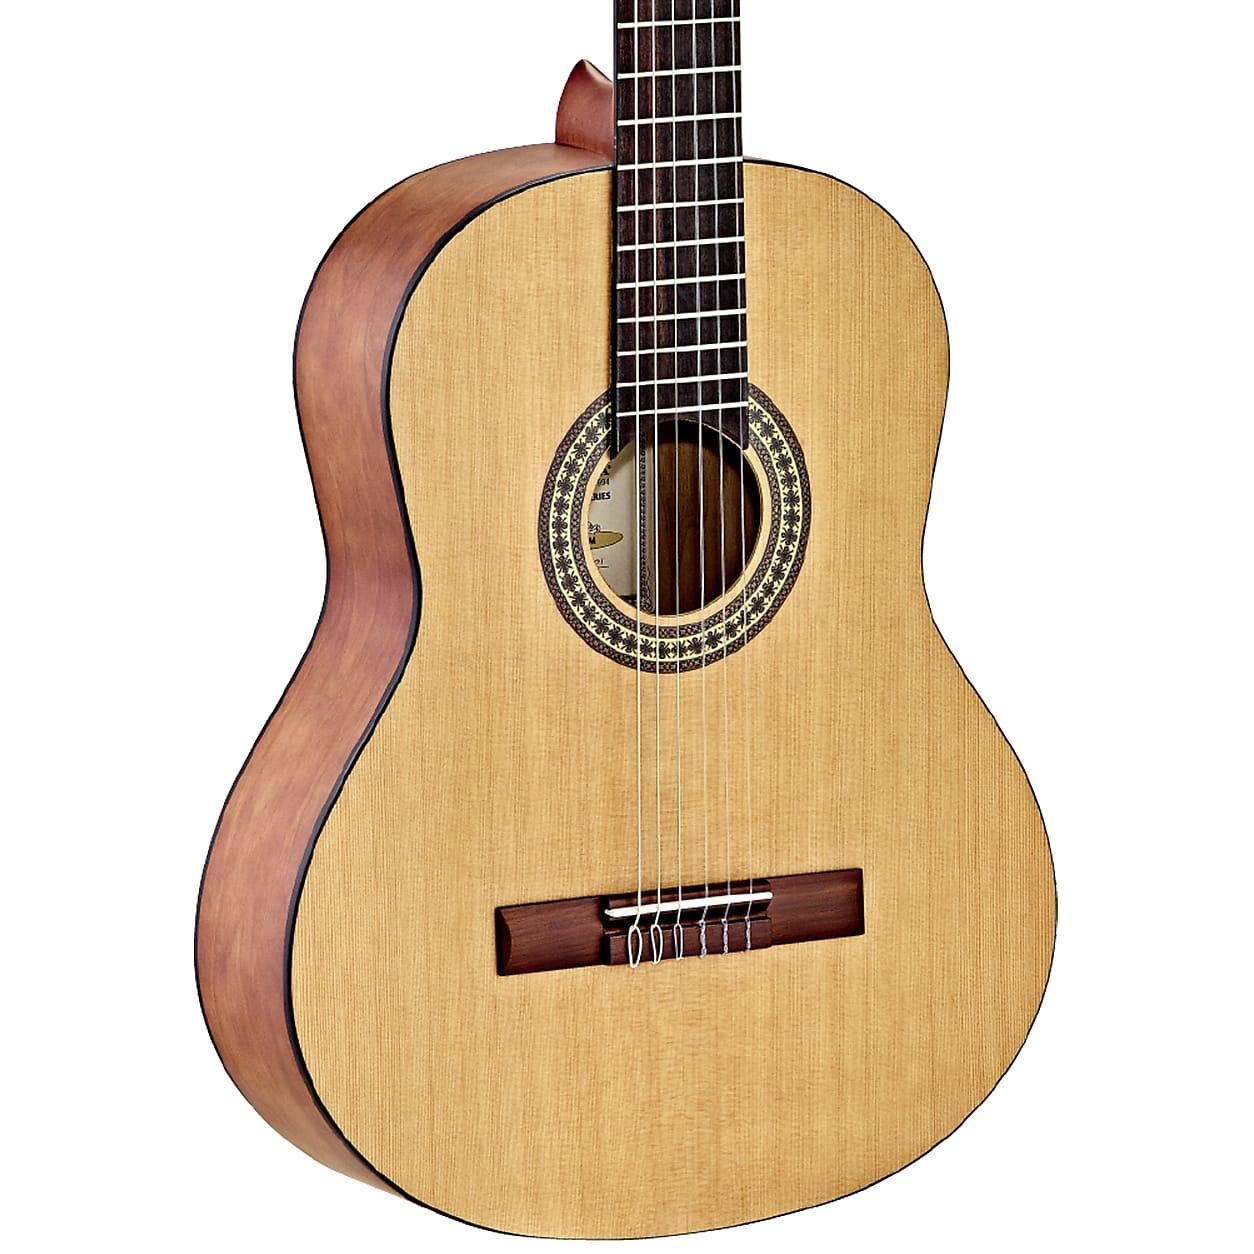 Ortega Student Series Cedar Top Nylon String Acoustic Guitar RSTC5M